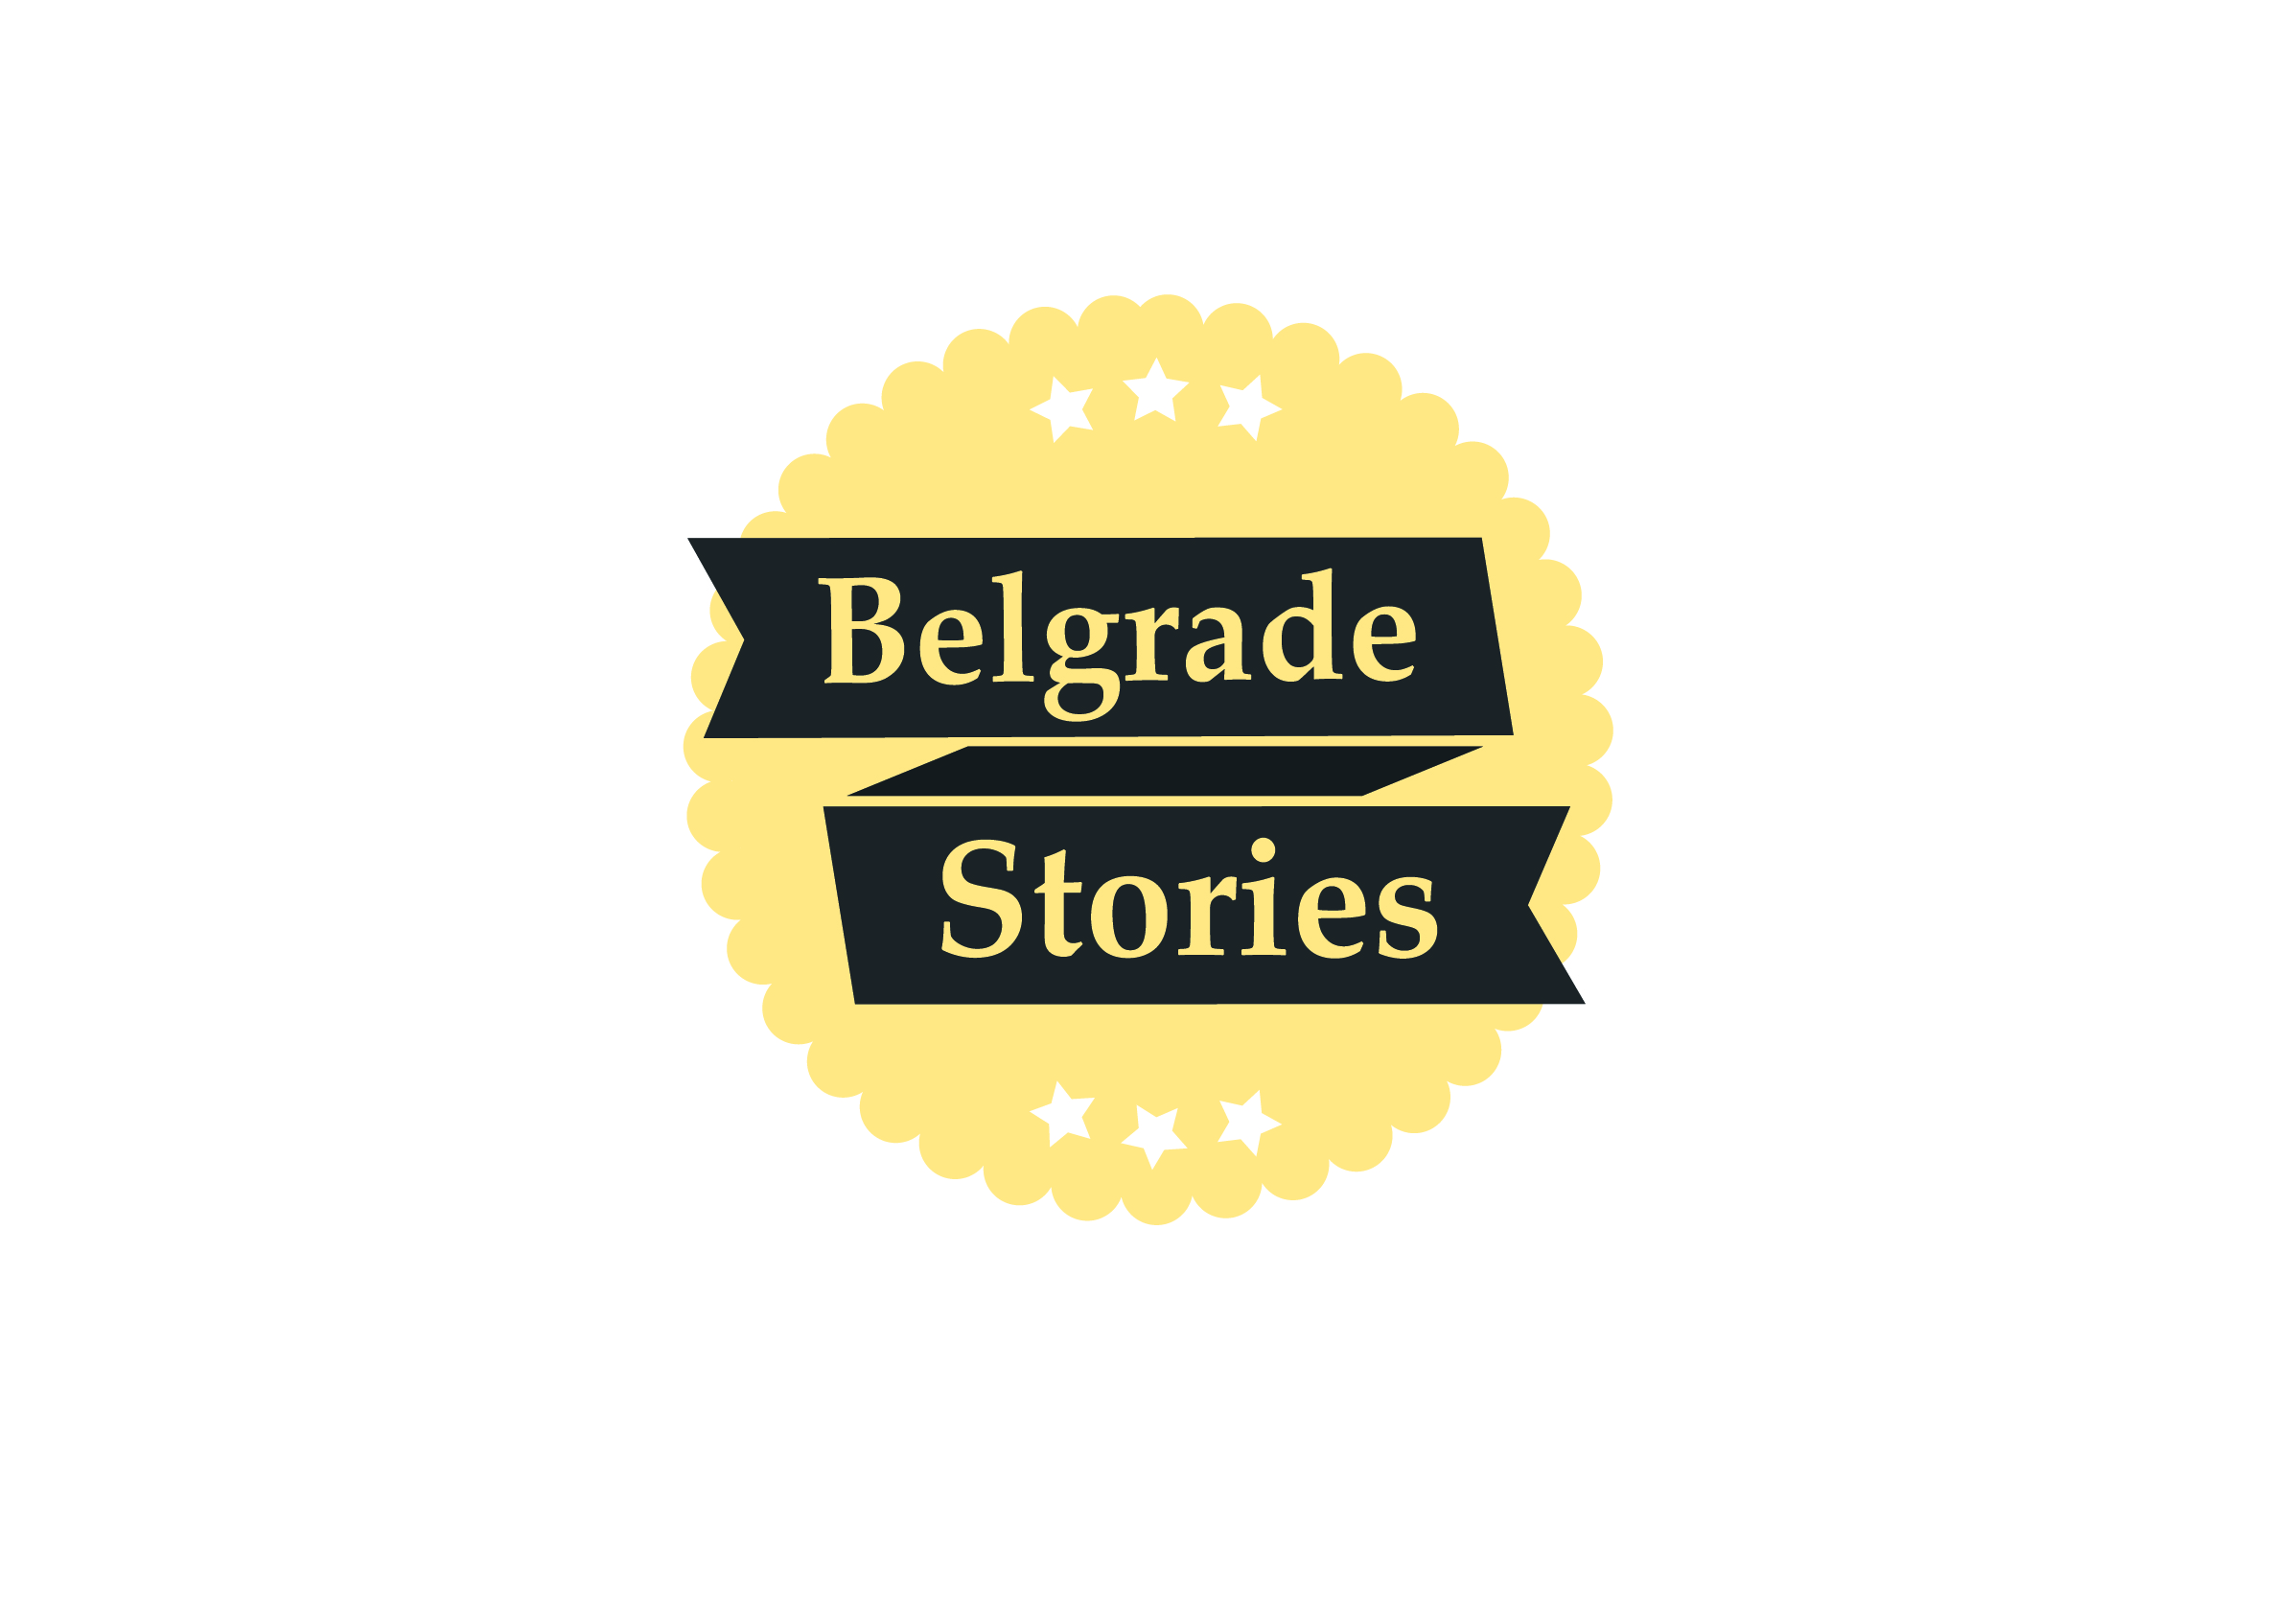 Логотип для агентства городских туров в Белграде фото f_533589b1c04a7f81.jpg